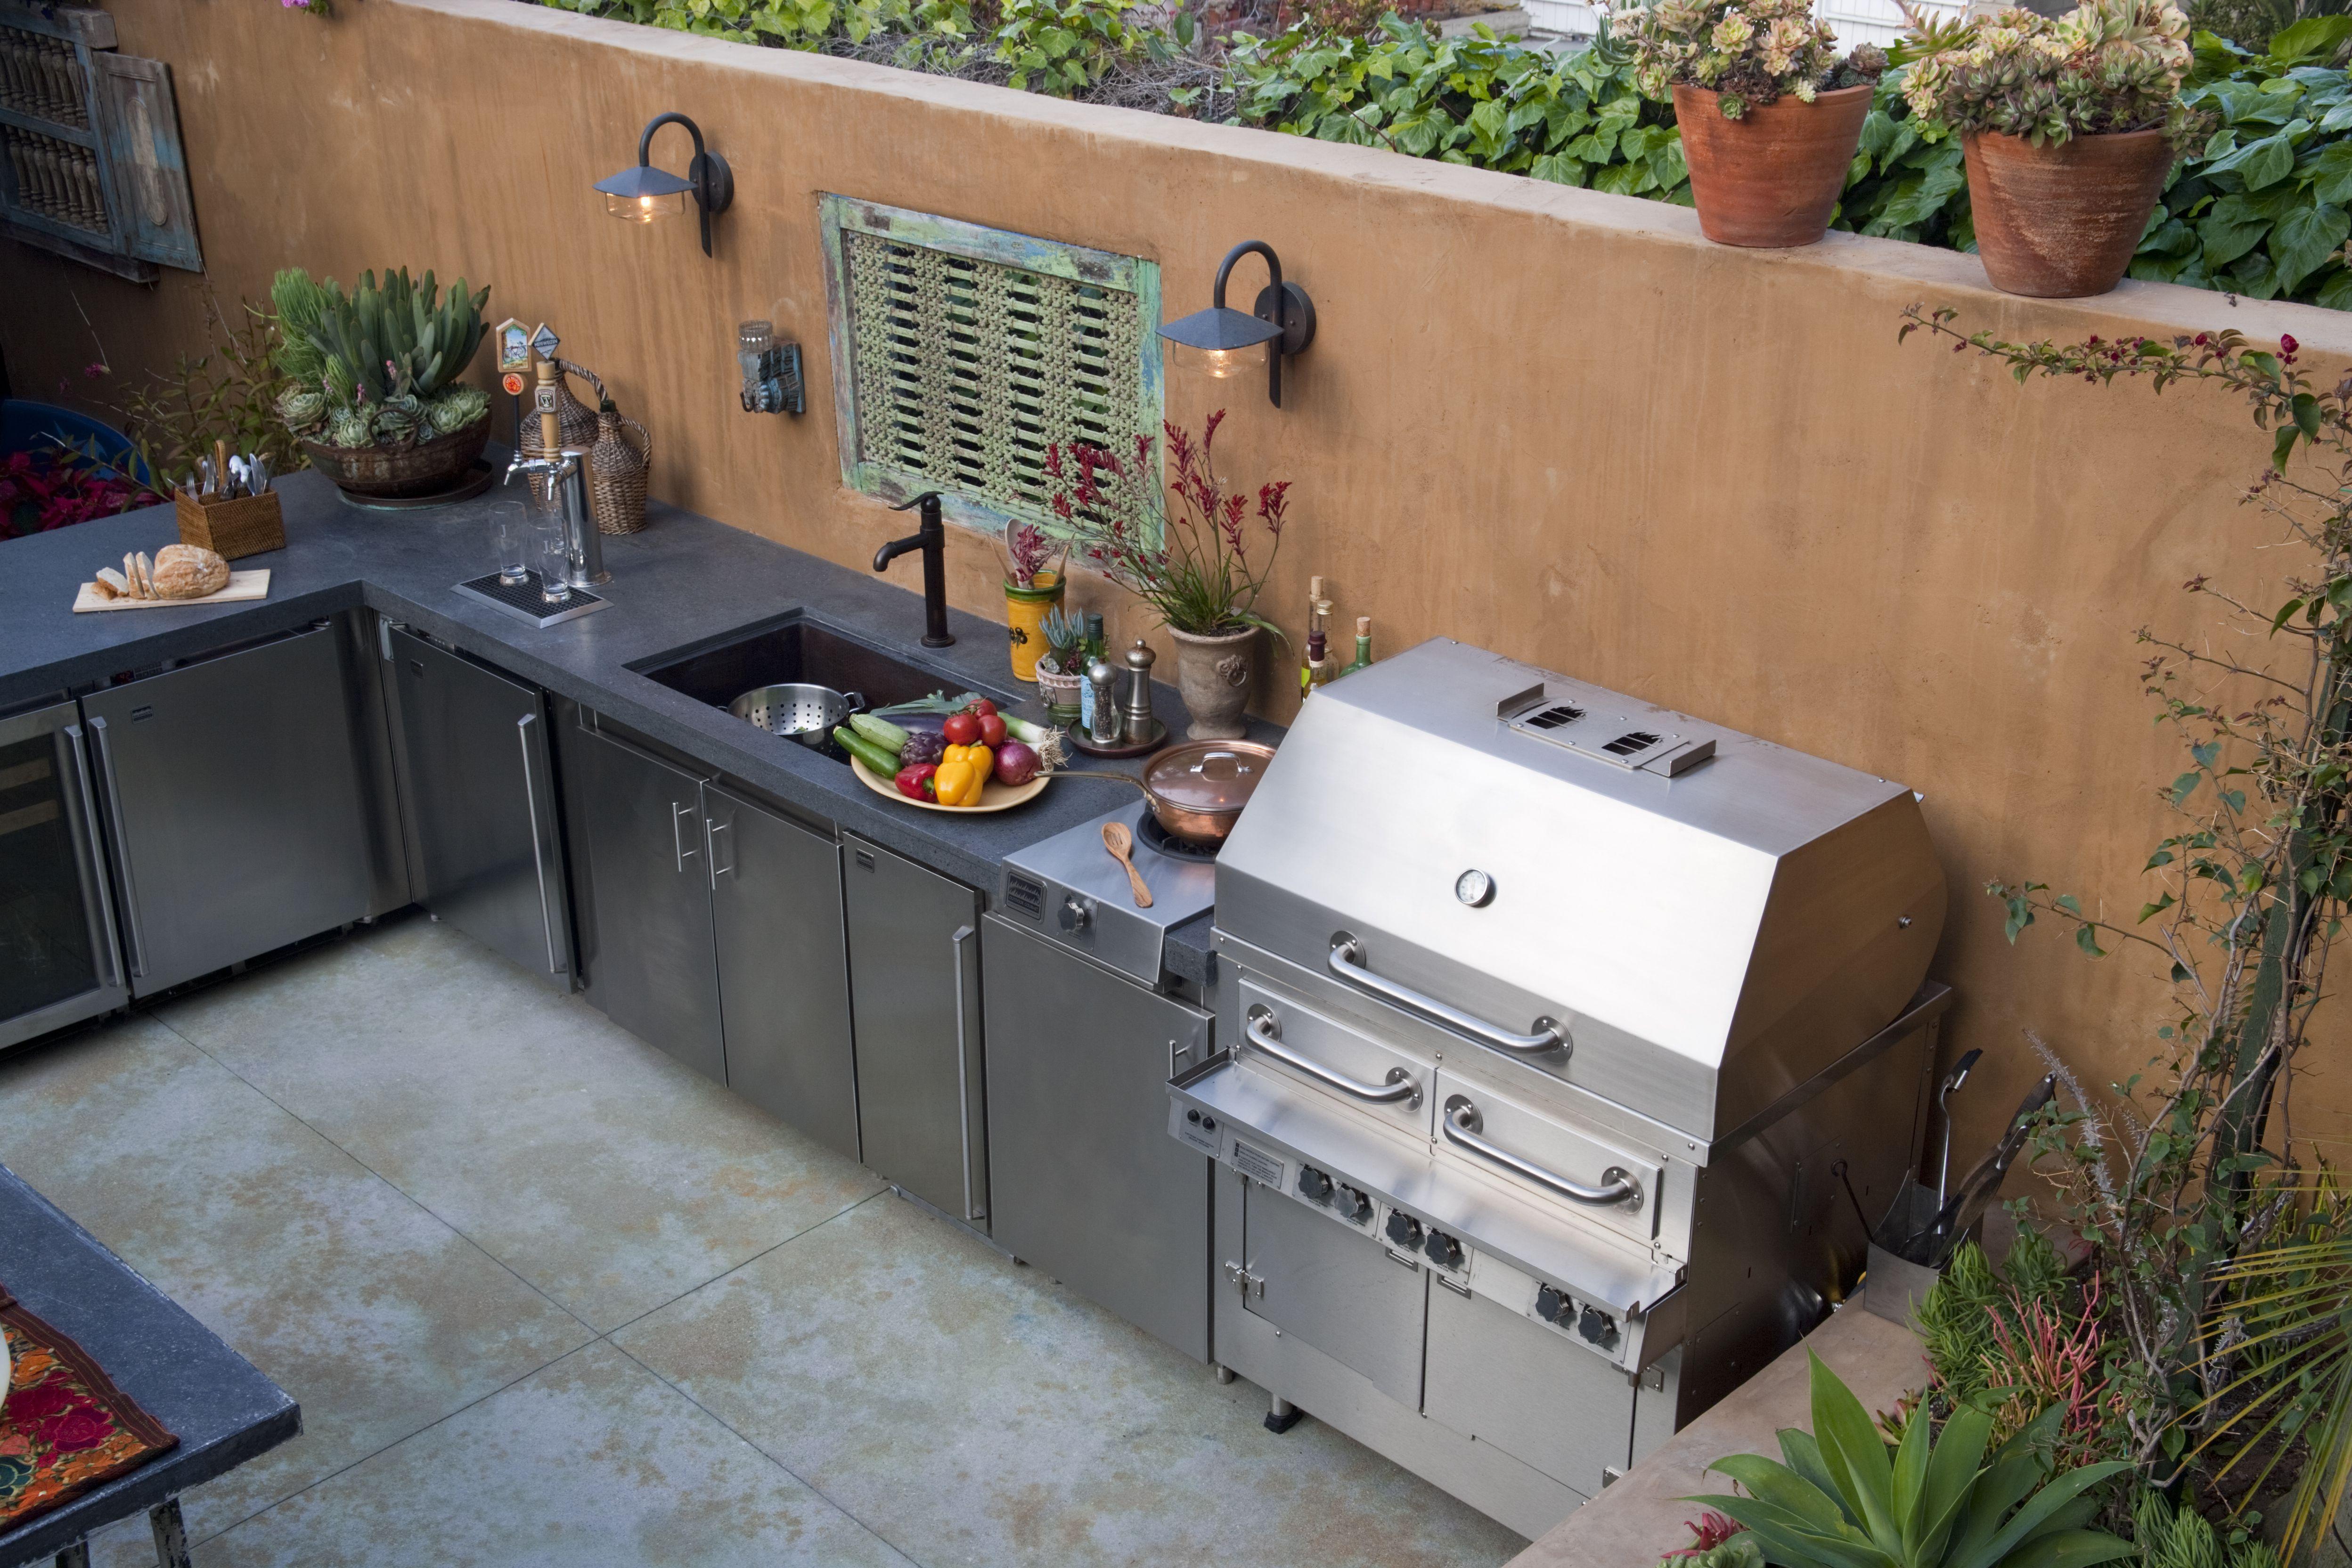 Consider Utilities When Planning Your Outdoor Kitchen